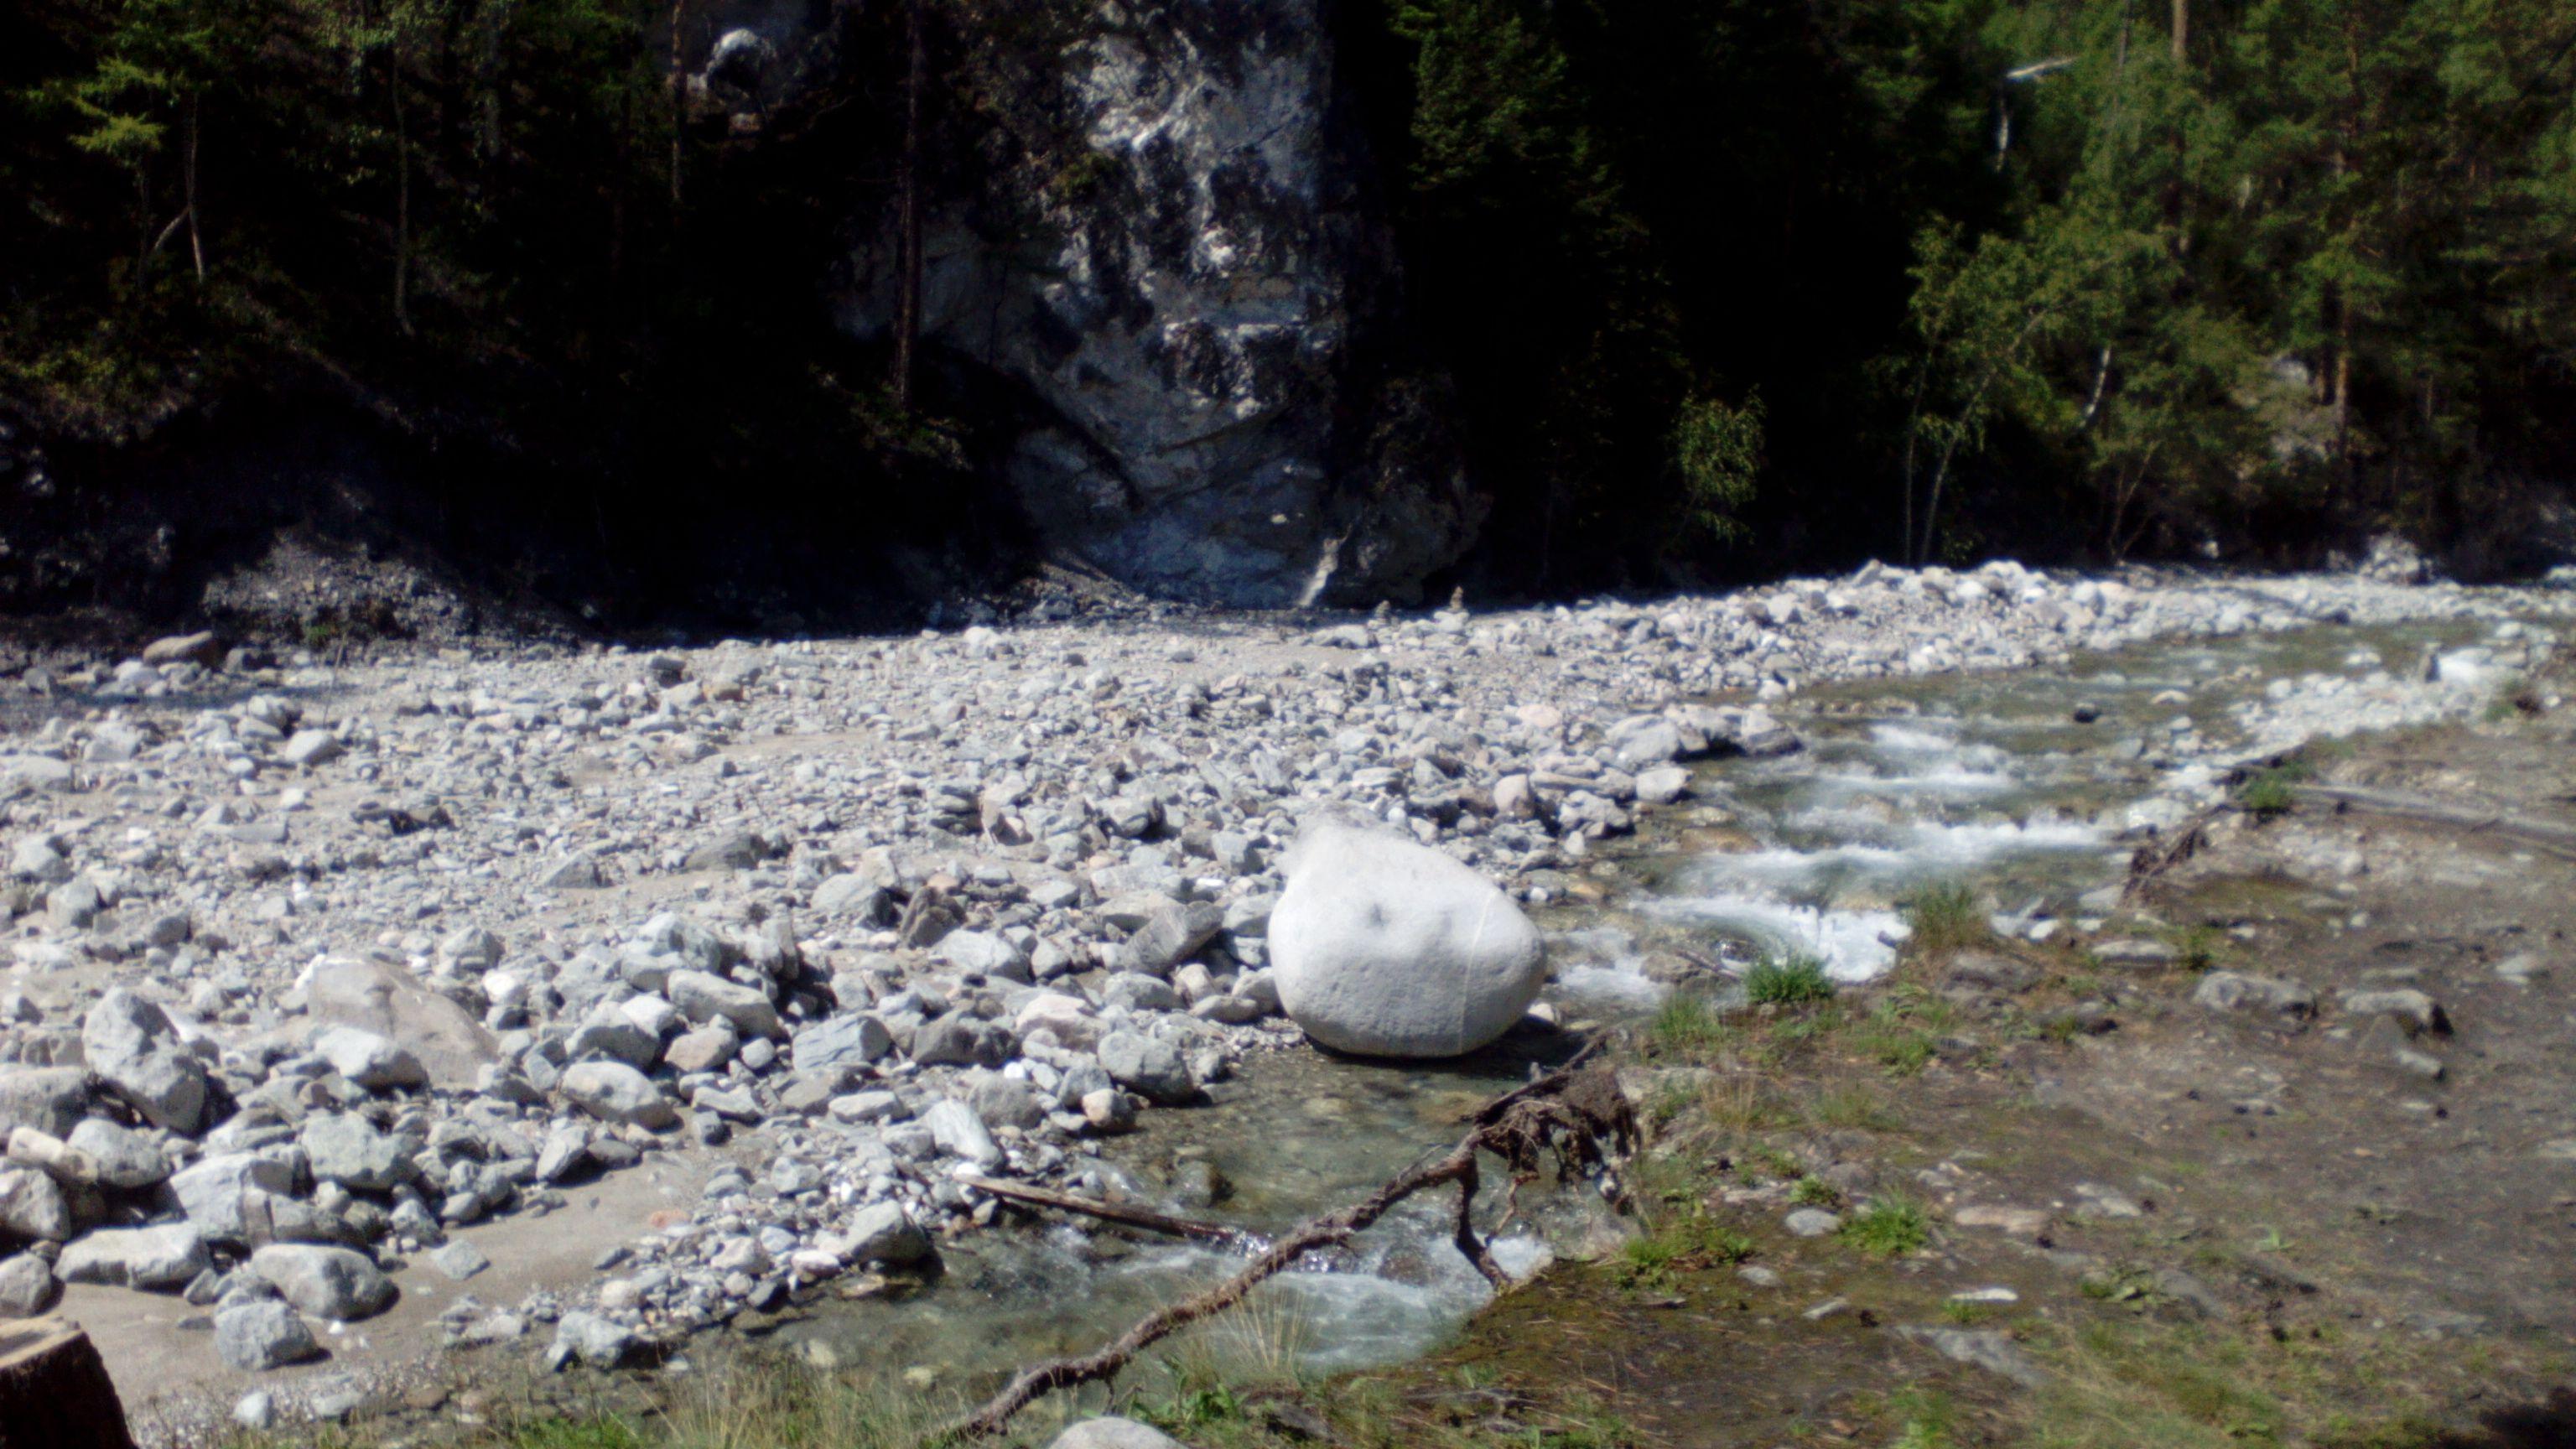 Река Кынгарга в камнях. Фото из архива блога shveda.ru